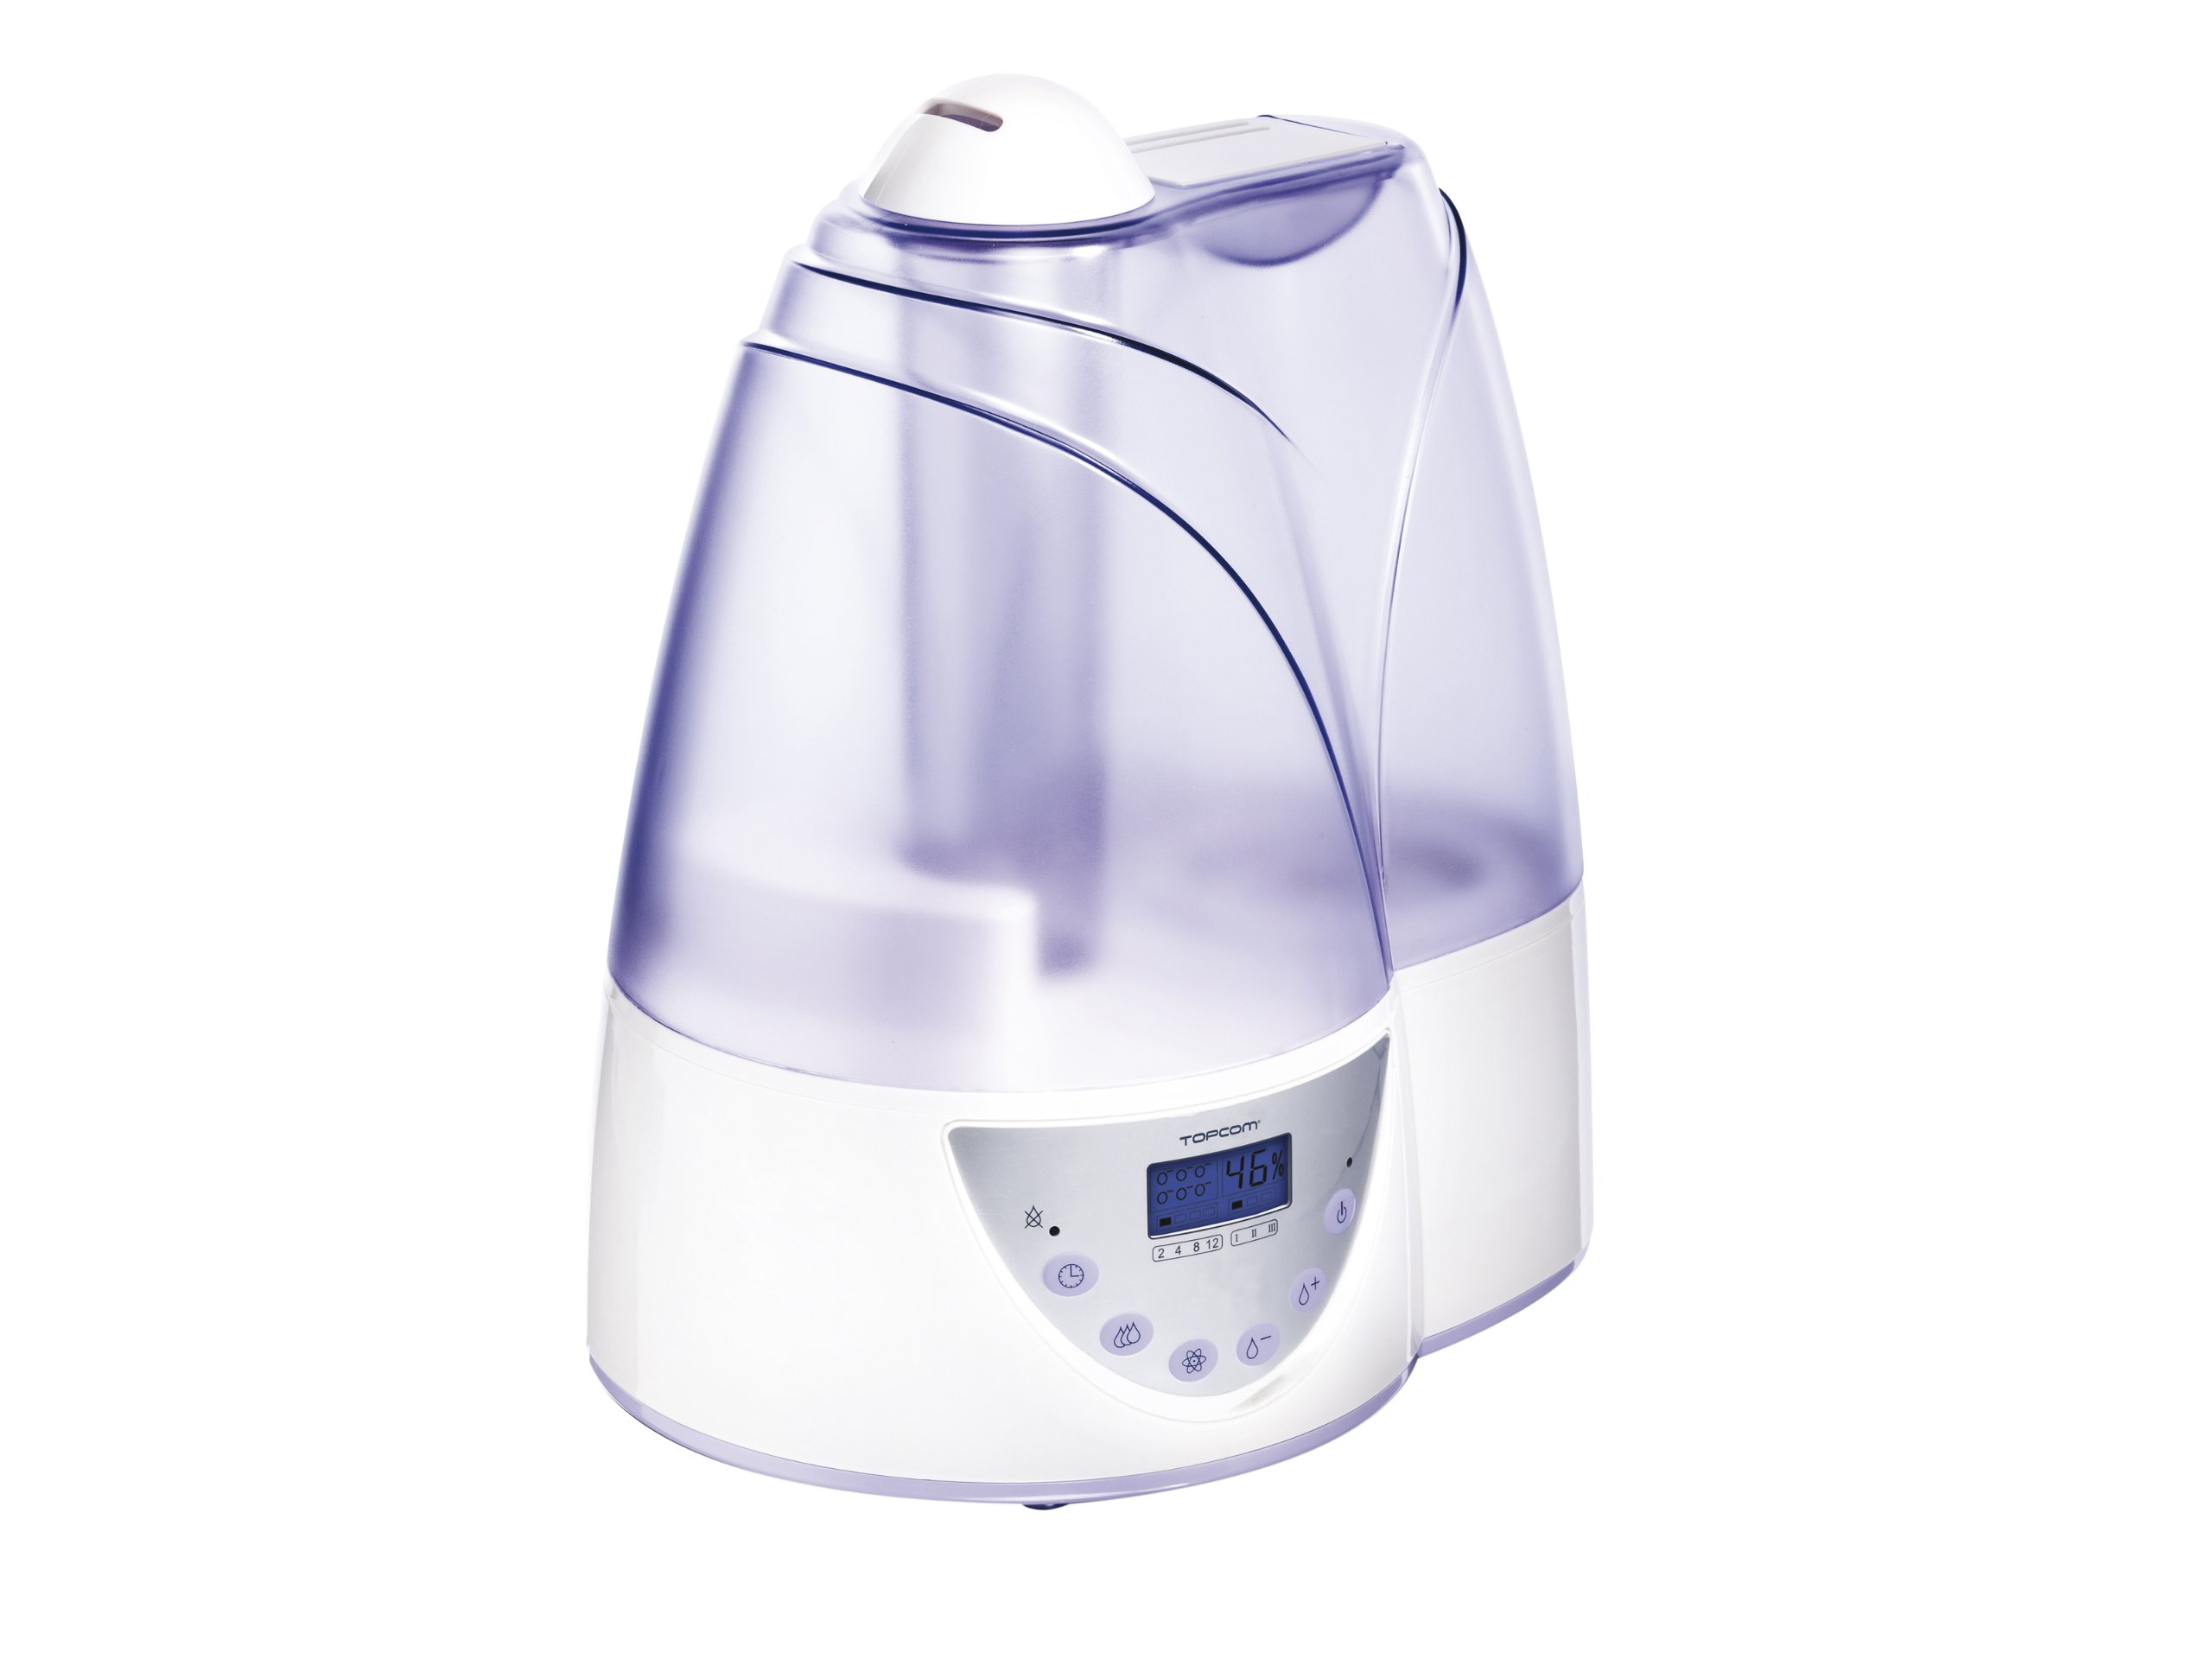 Topcom LF-4718 humidifier - humidifiers (LCD, LCD, White)